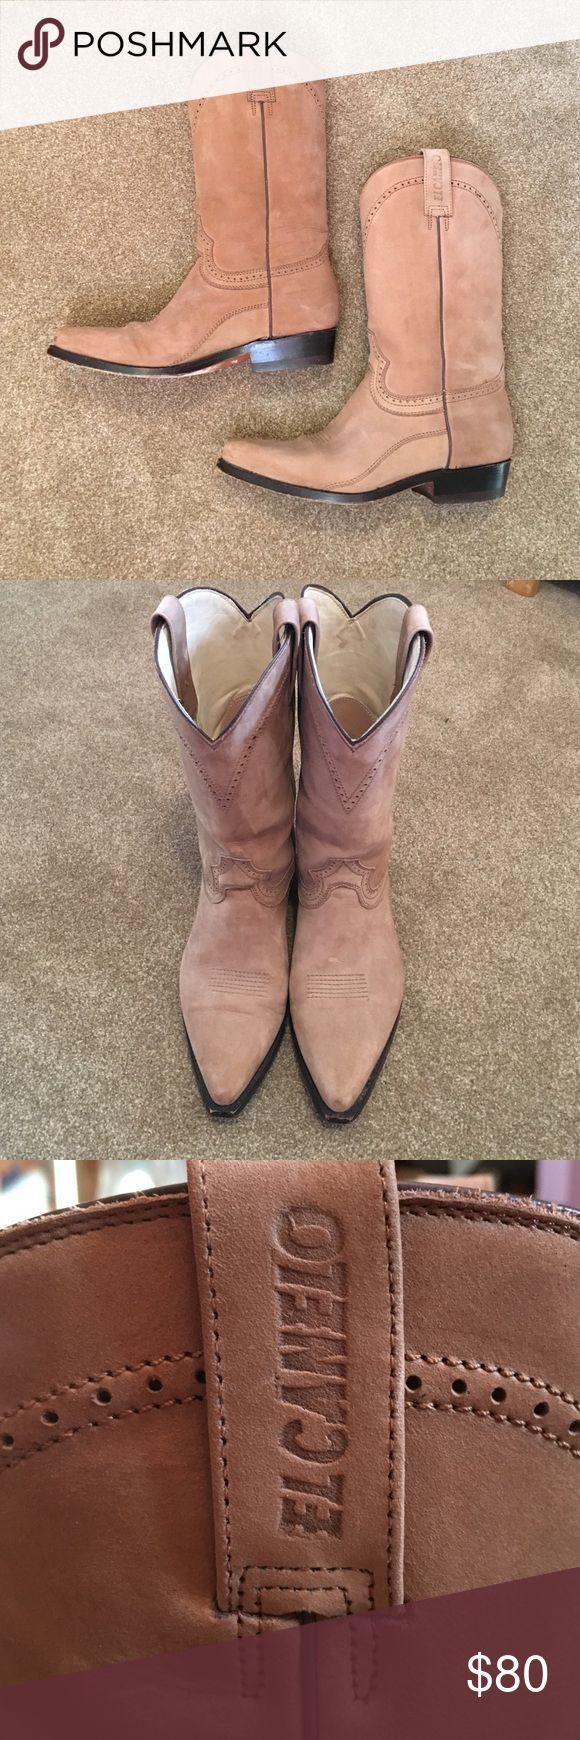 cowboy boots Tan suede boots el canelo Shoes